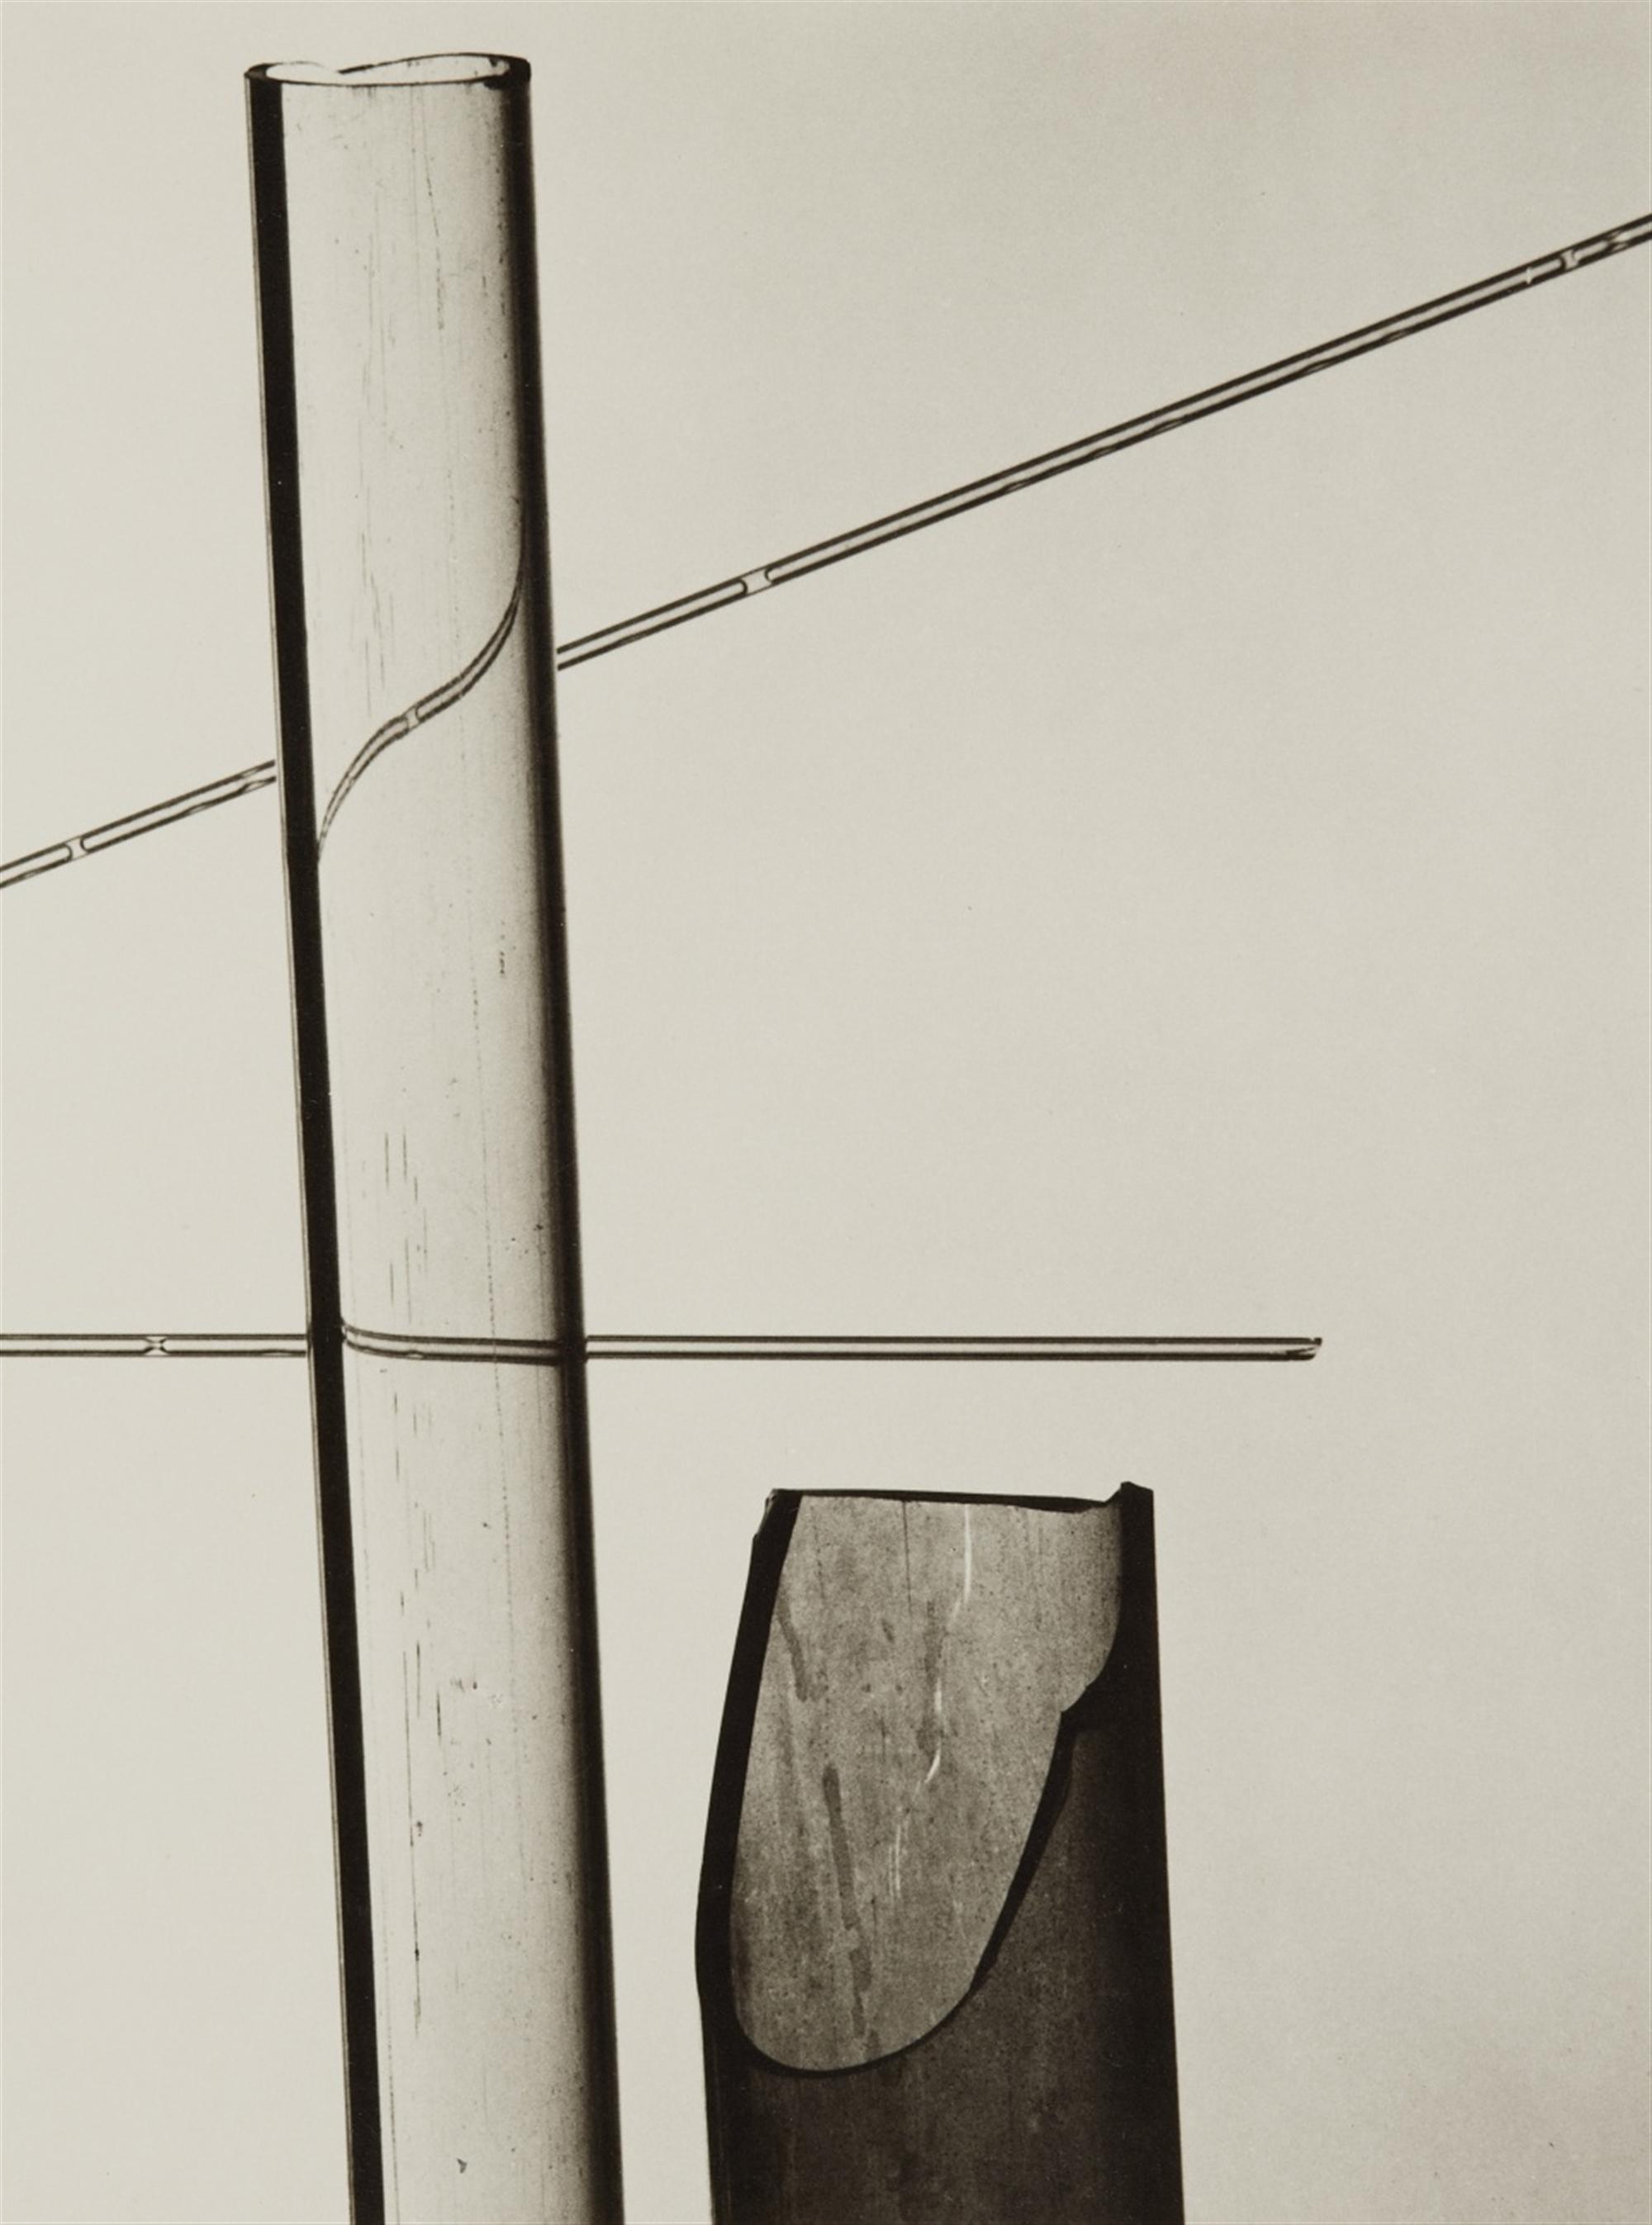 Willy Zielke, Photographie (N)